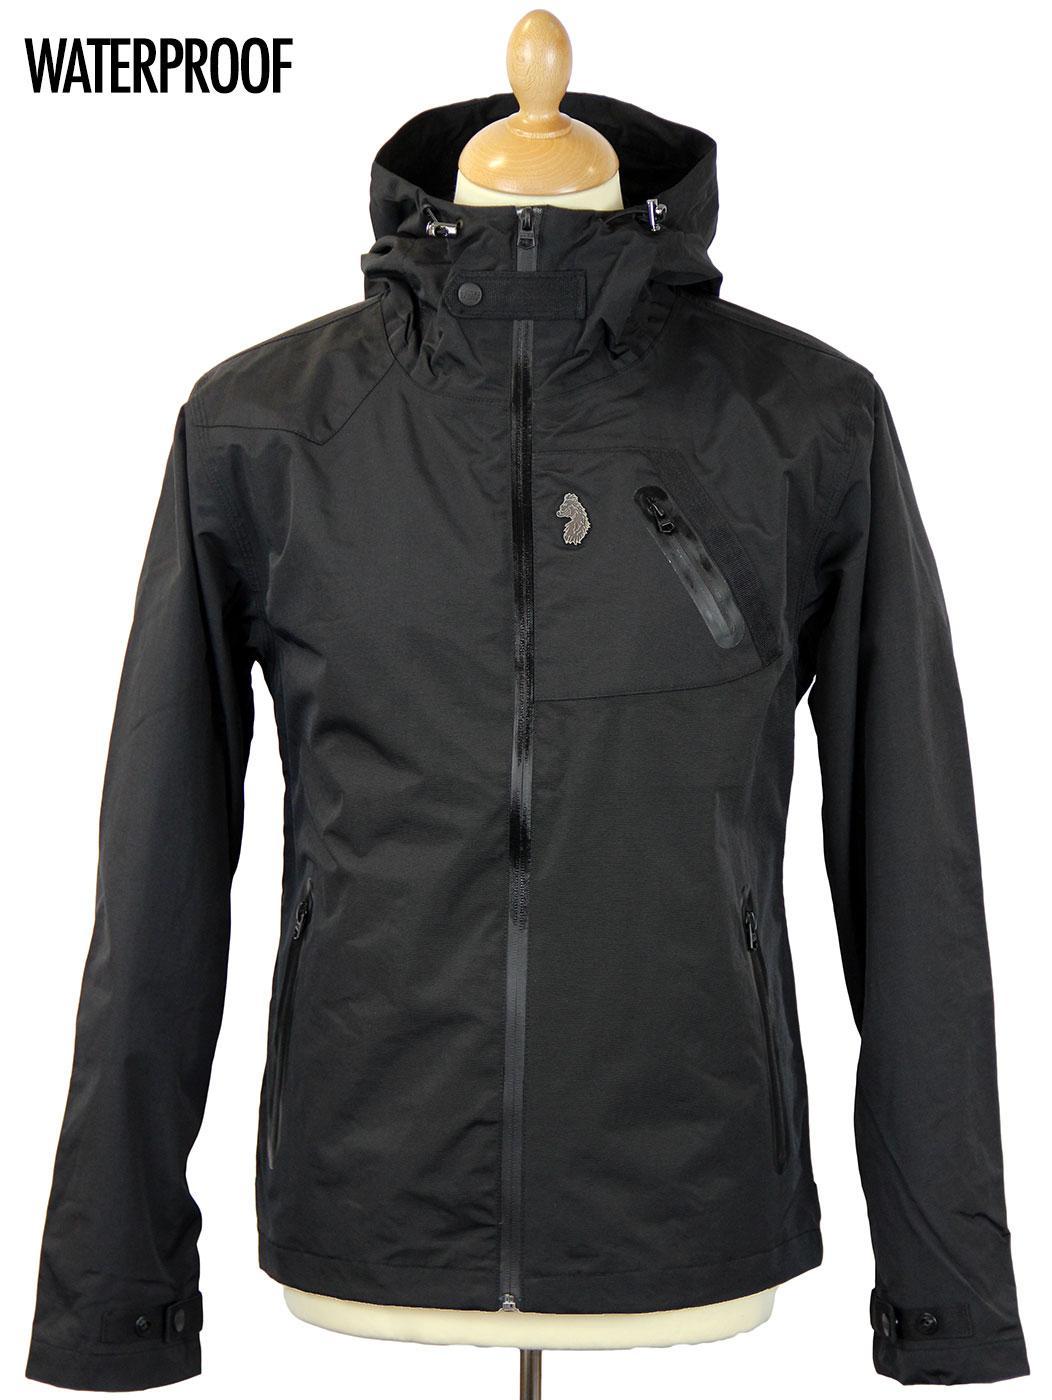 Luke 1977 Complete Showers Jacket CP1438